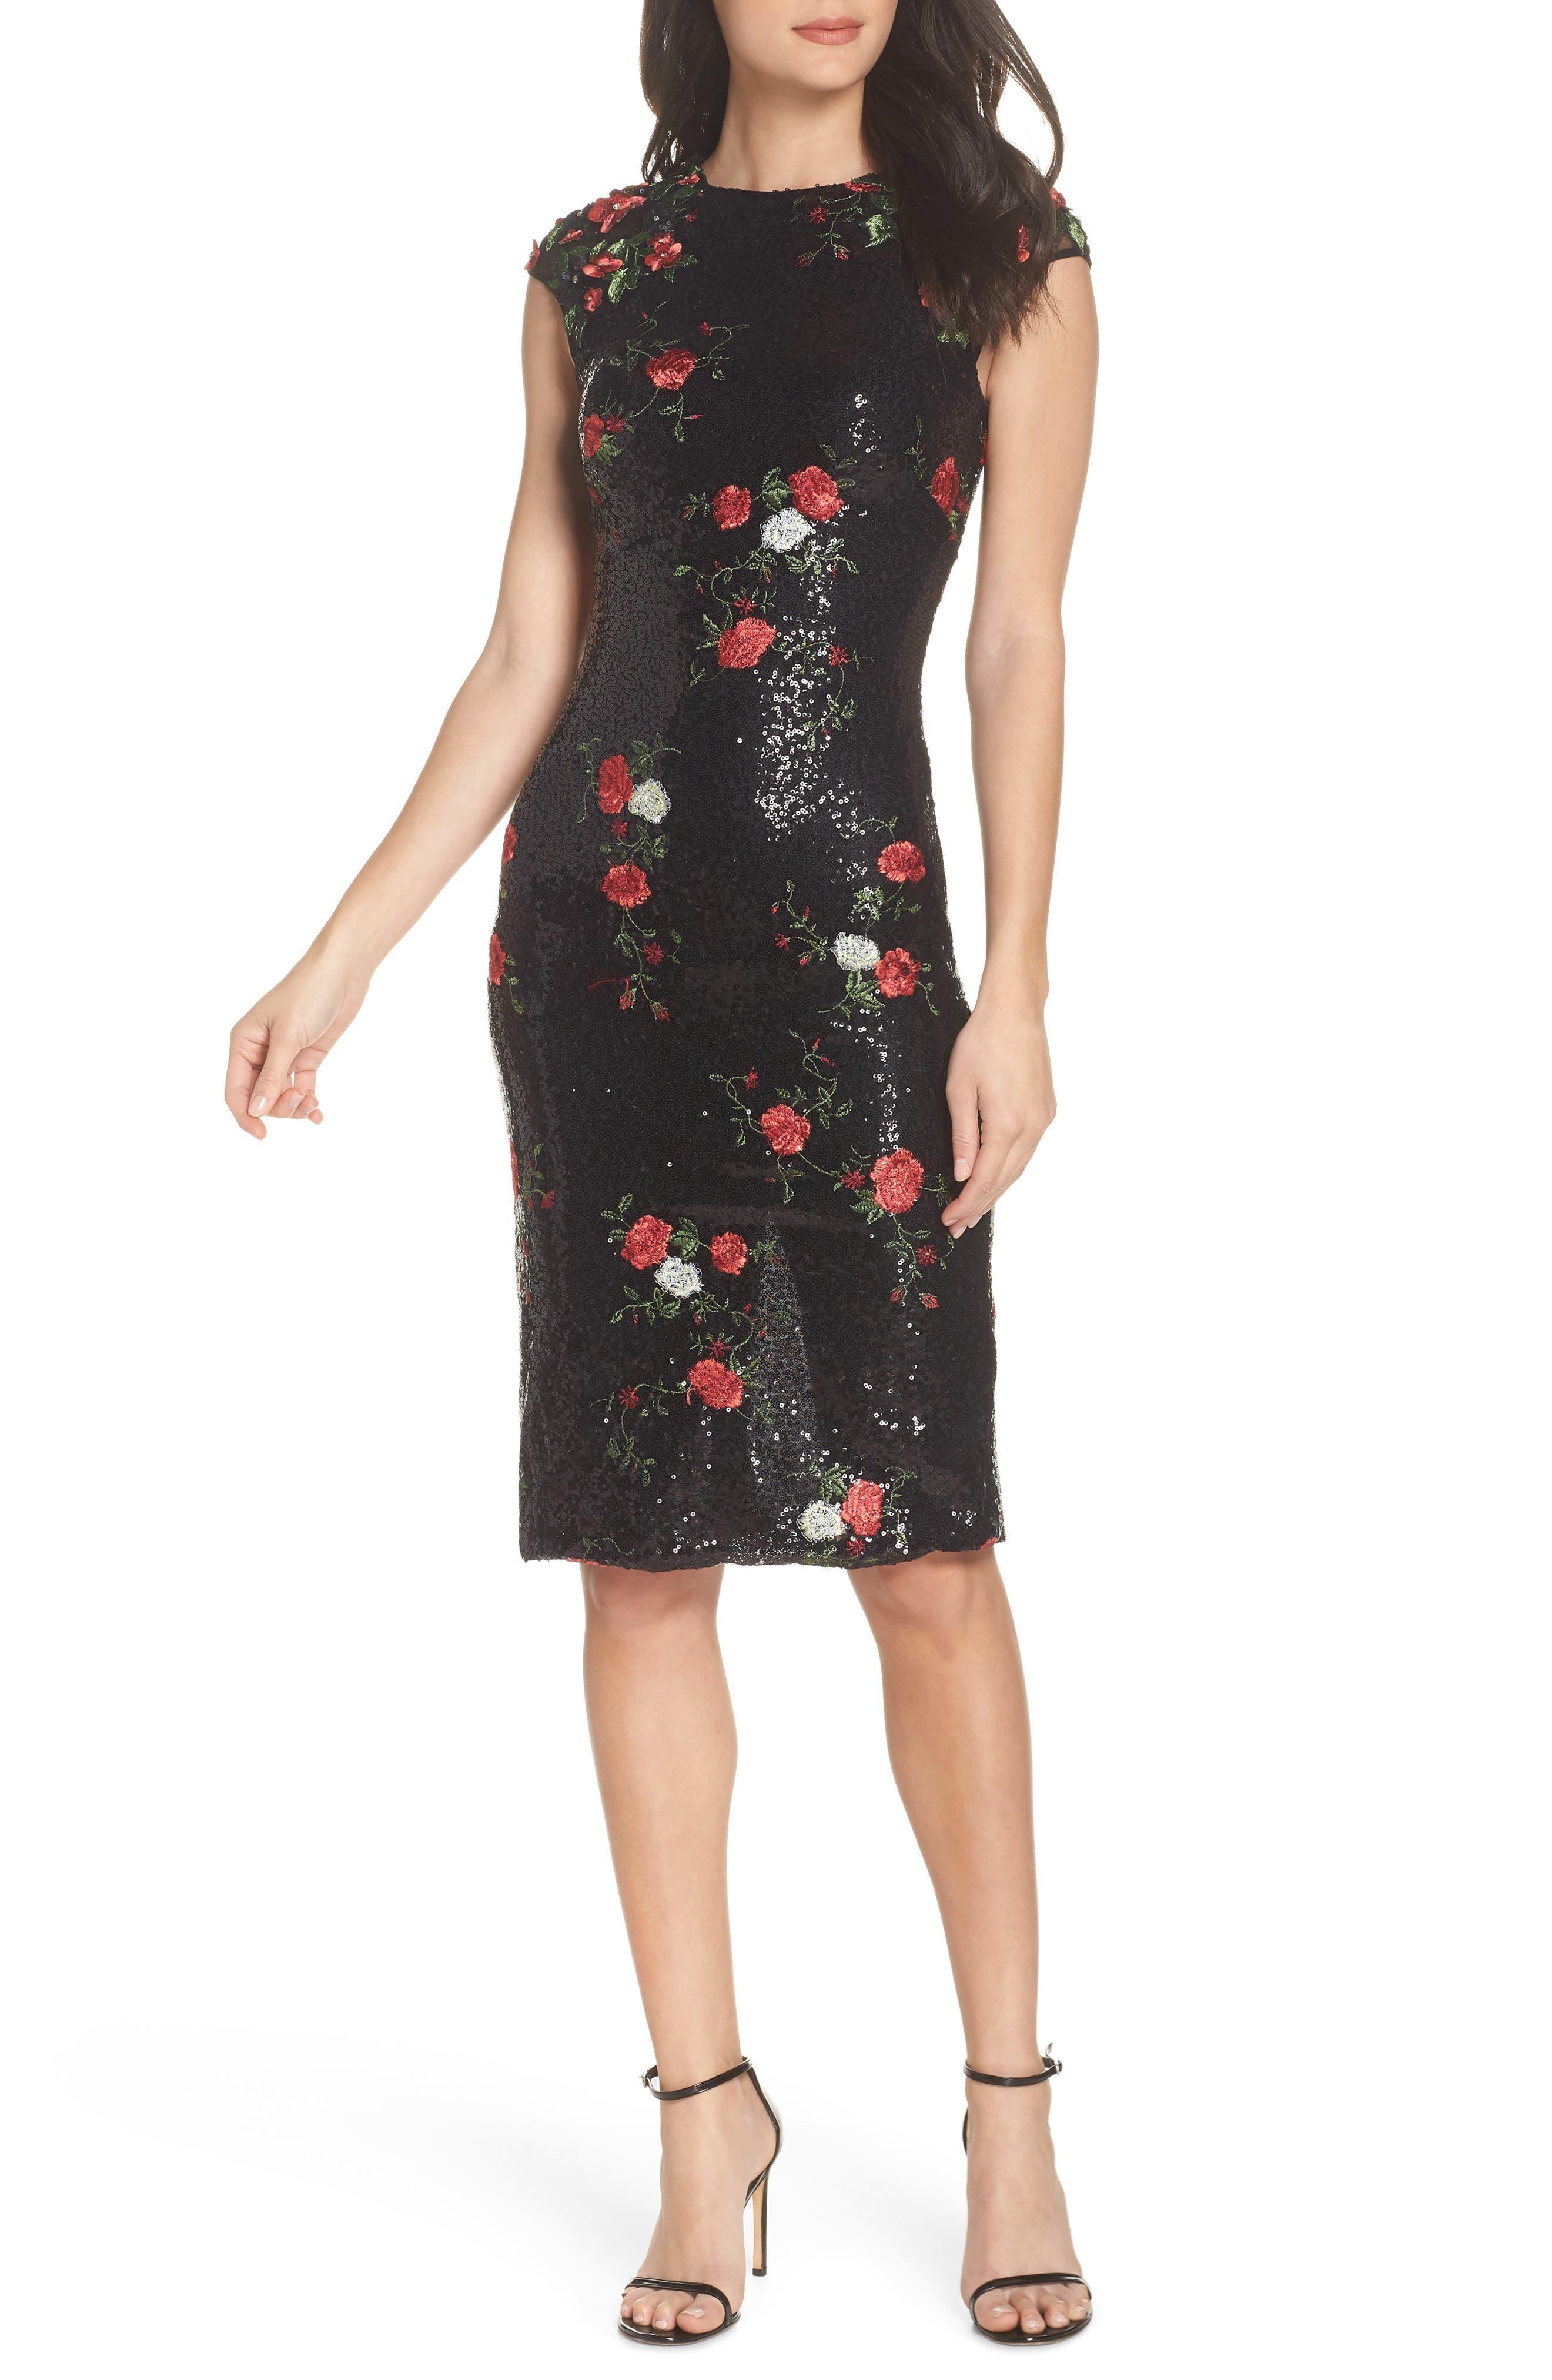 MAC DUGGAL, Sequin & Embroidery Sheath Dress, Main thumbnail 1, color, BLACK ROSE